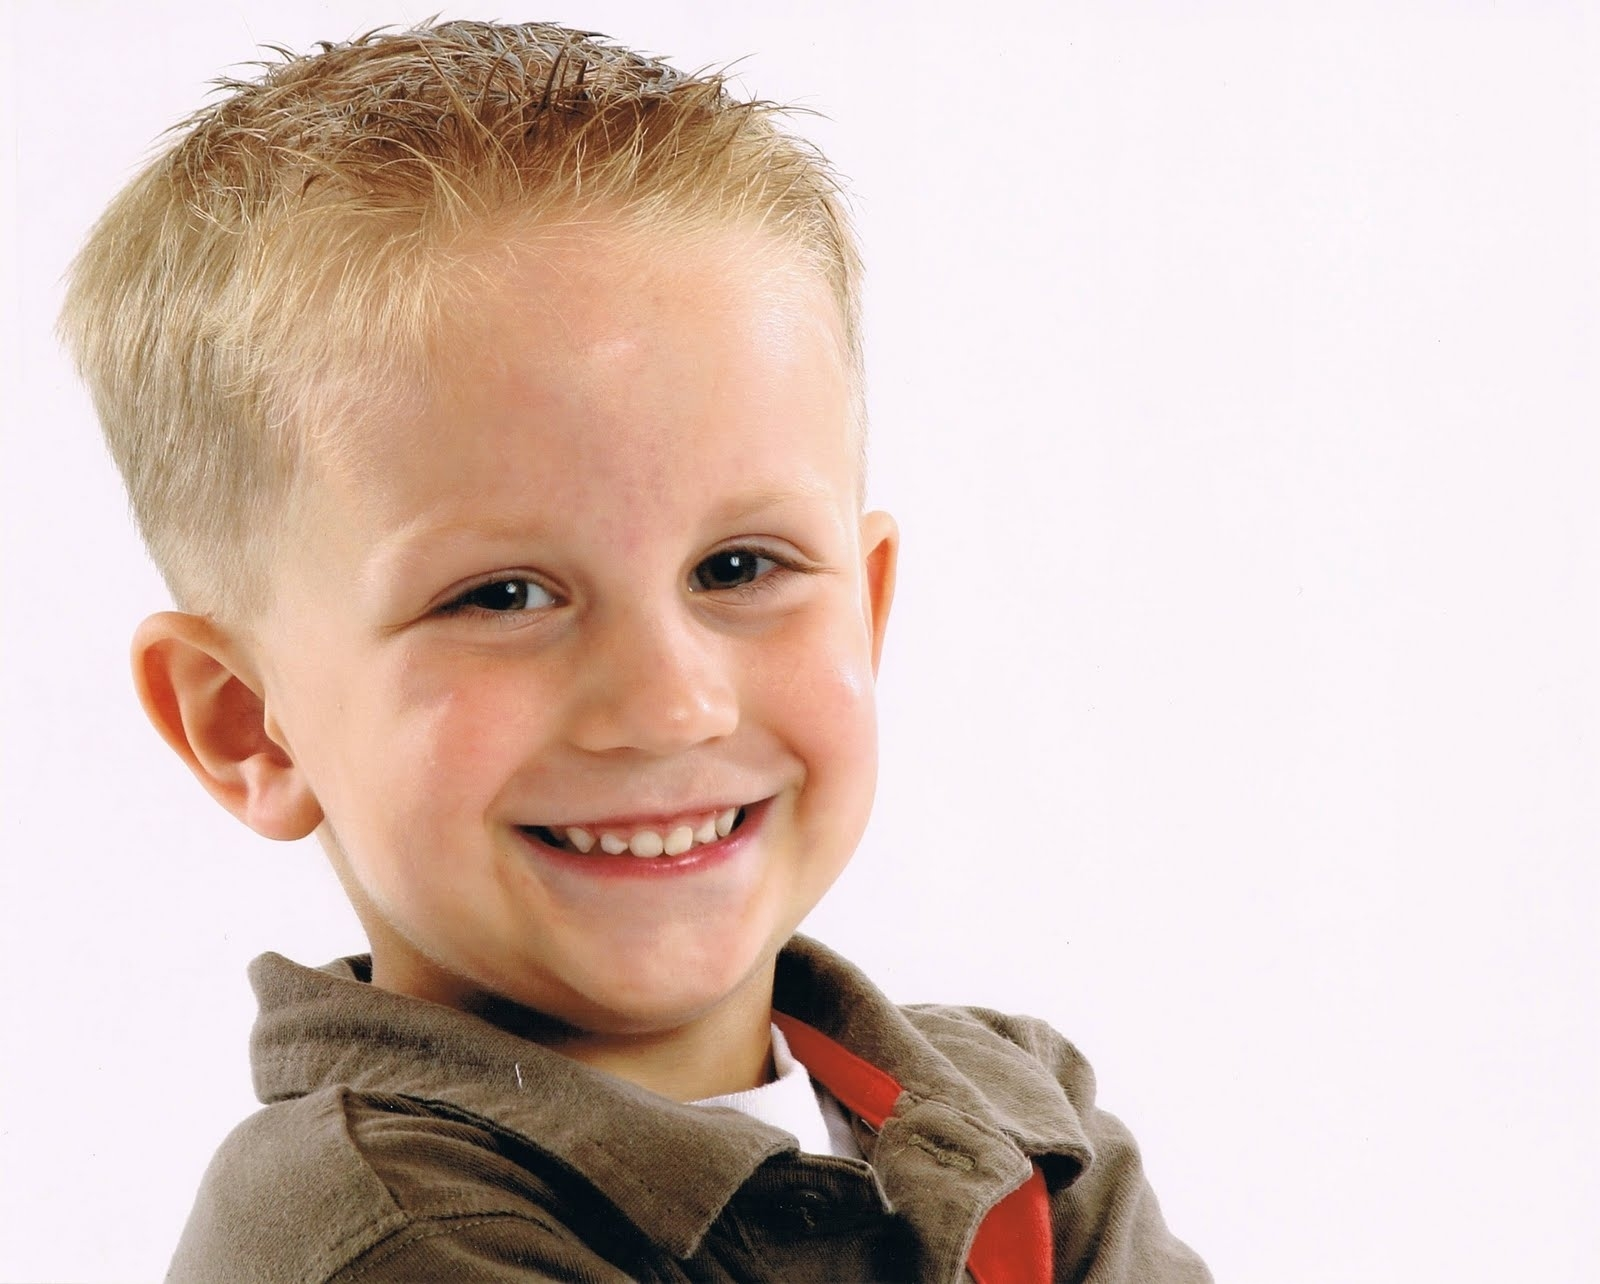 proper 10 years olds hait cut - wavy haircut